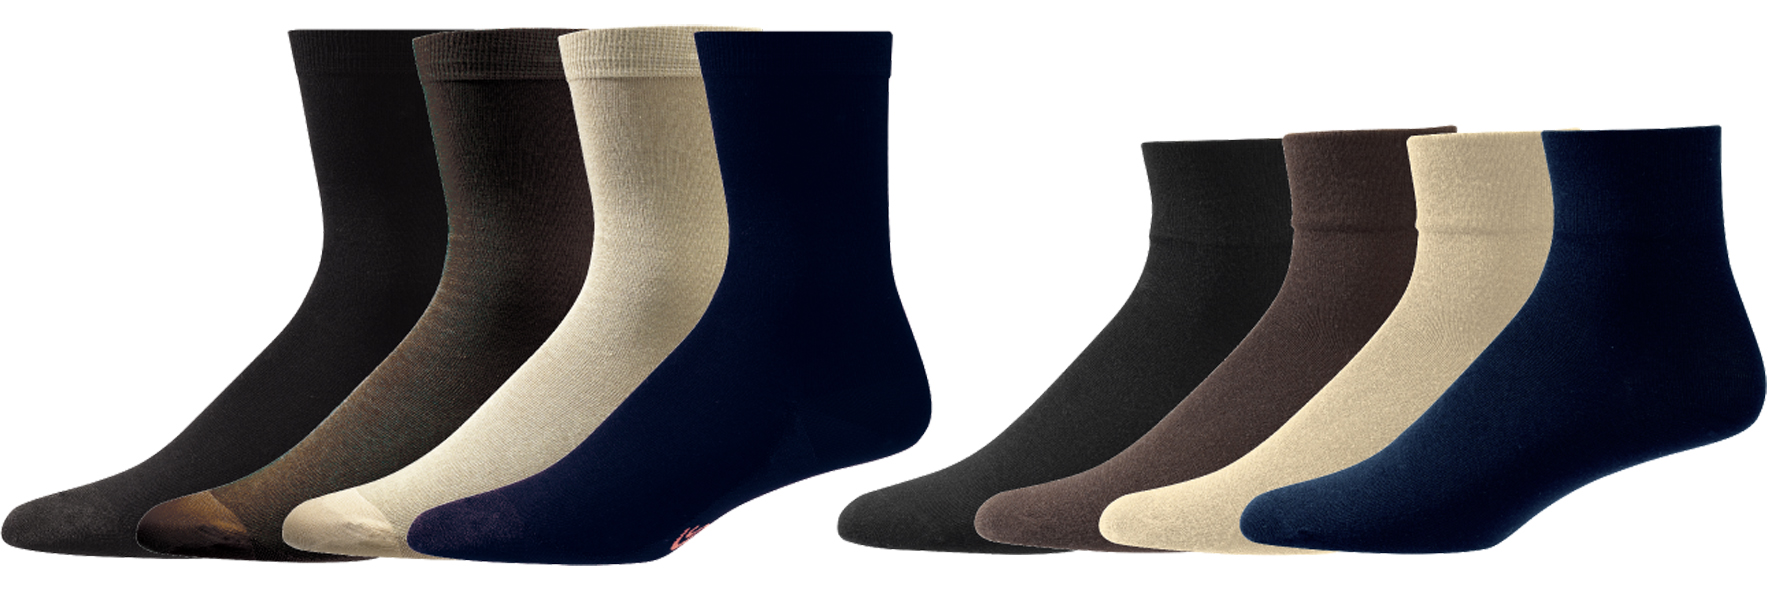 Aetrex Copper Socks 4.jpg